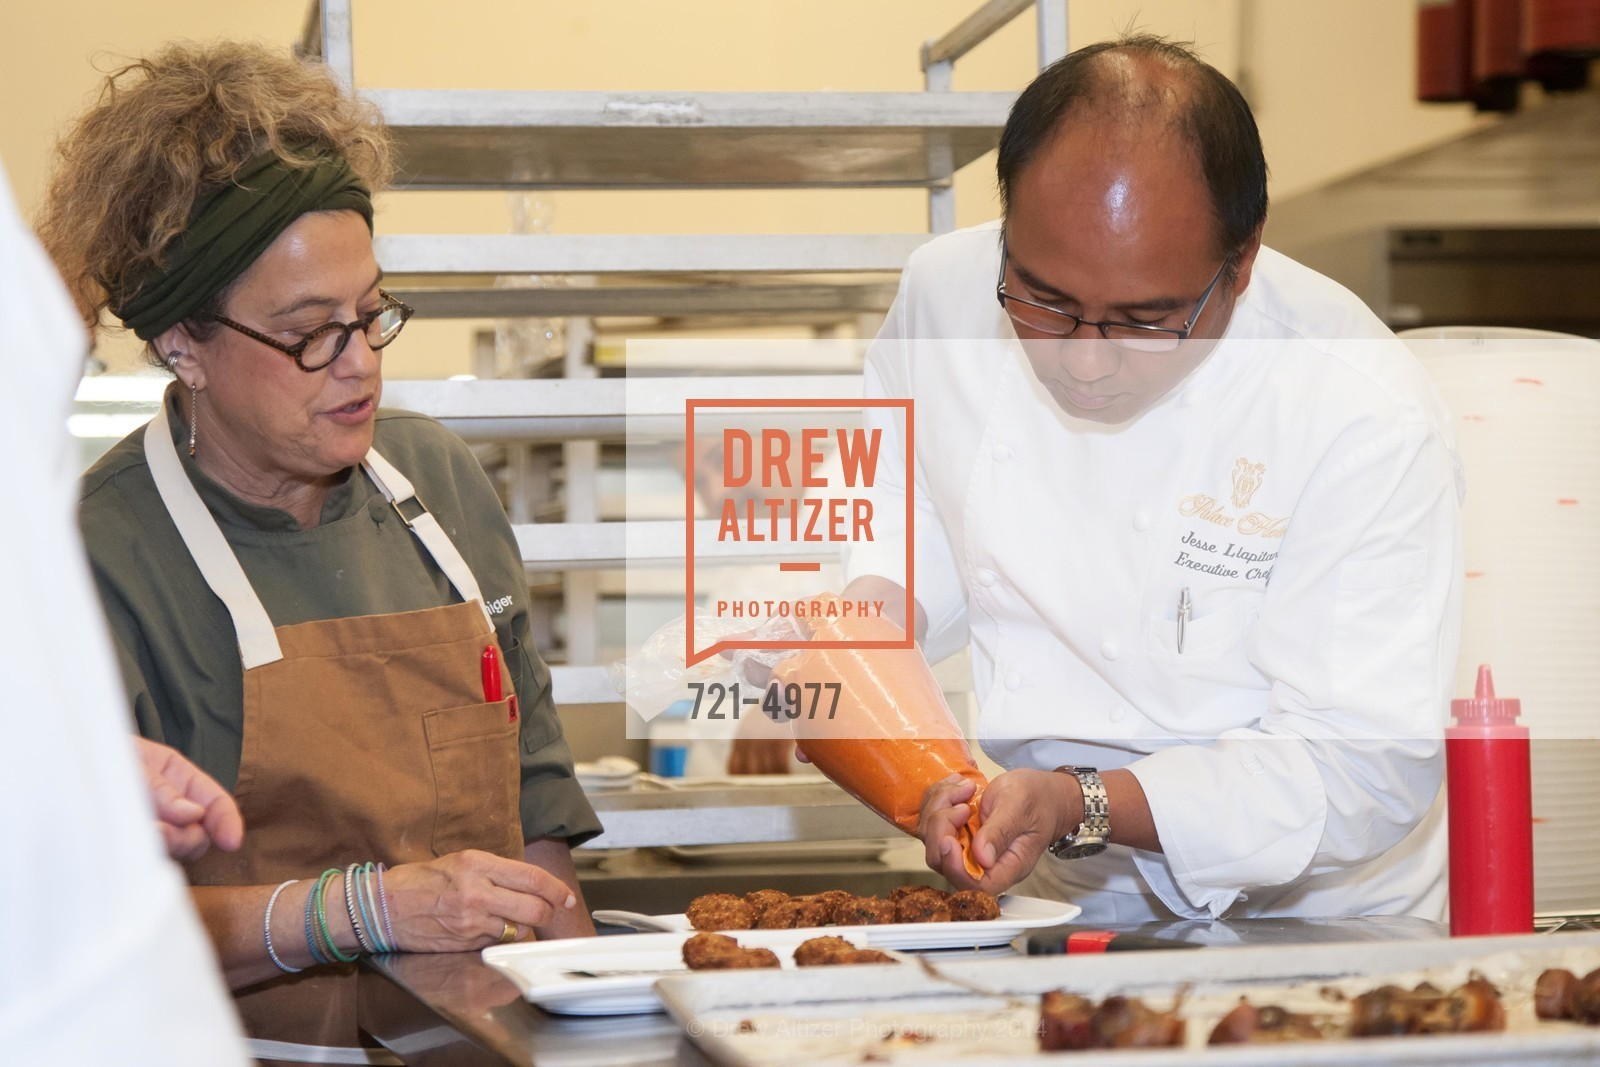 Susan Feniger, Executive Chef Jesse Llapitan, Photo #721-4977